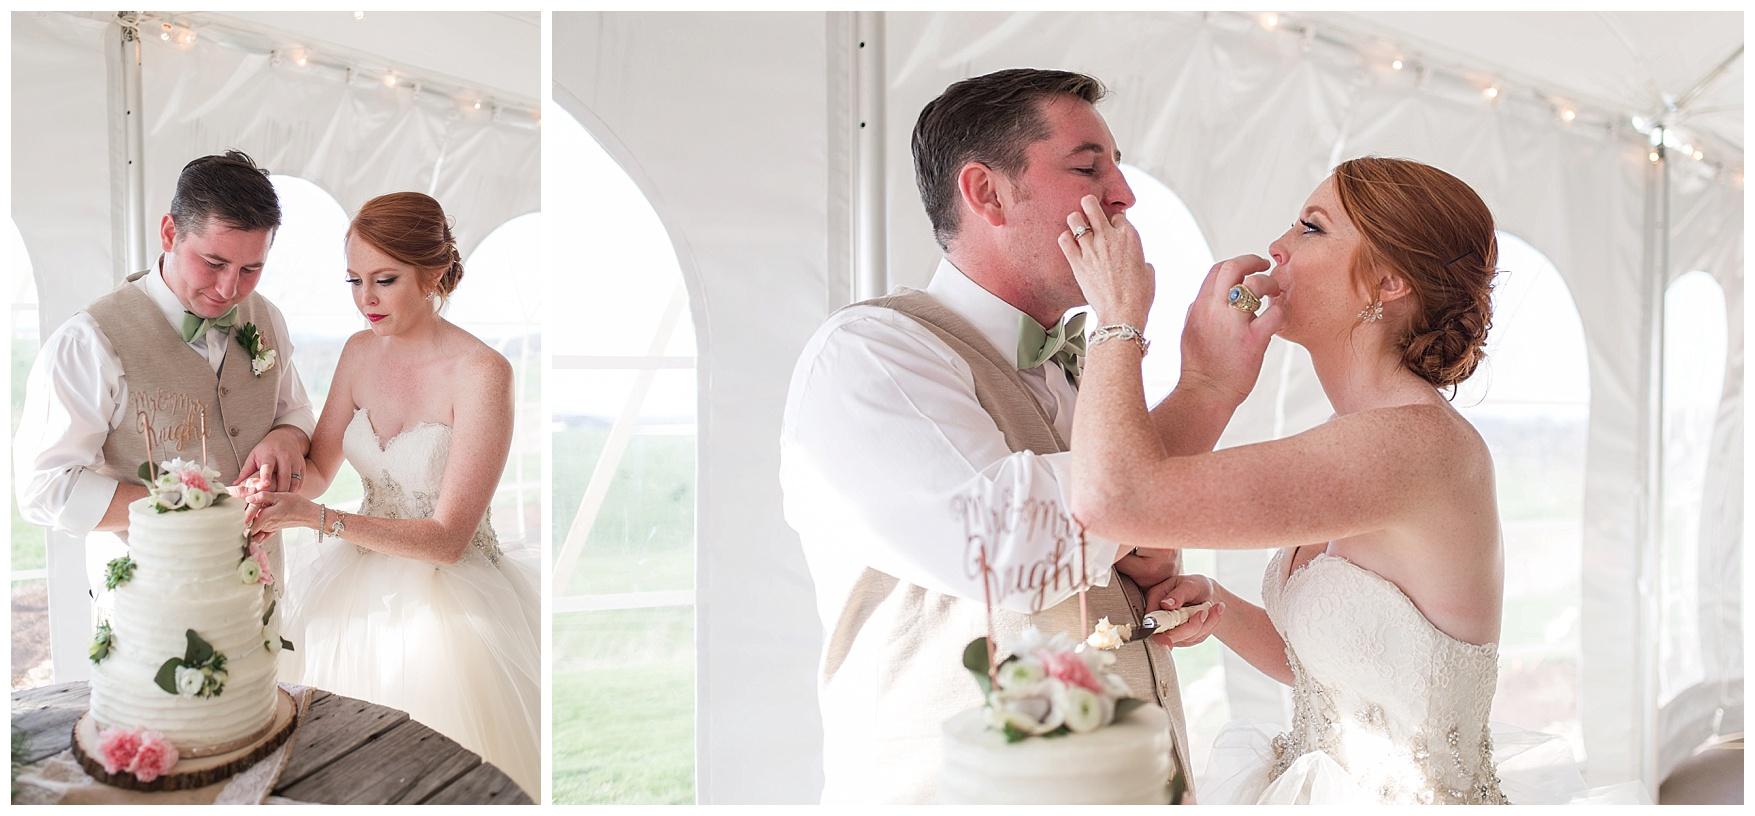 Tent Reception Photos atOn the Sunny Slope Farm Wedding || Harrisonburg, Virginia Wedding Photographer || Lynchburg VA Photographer